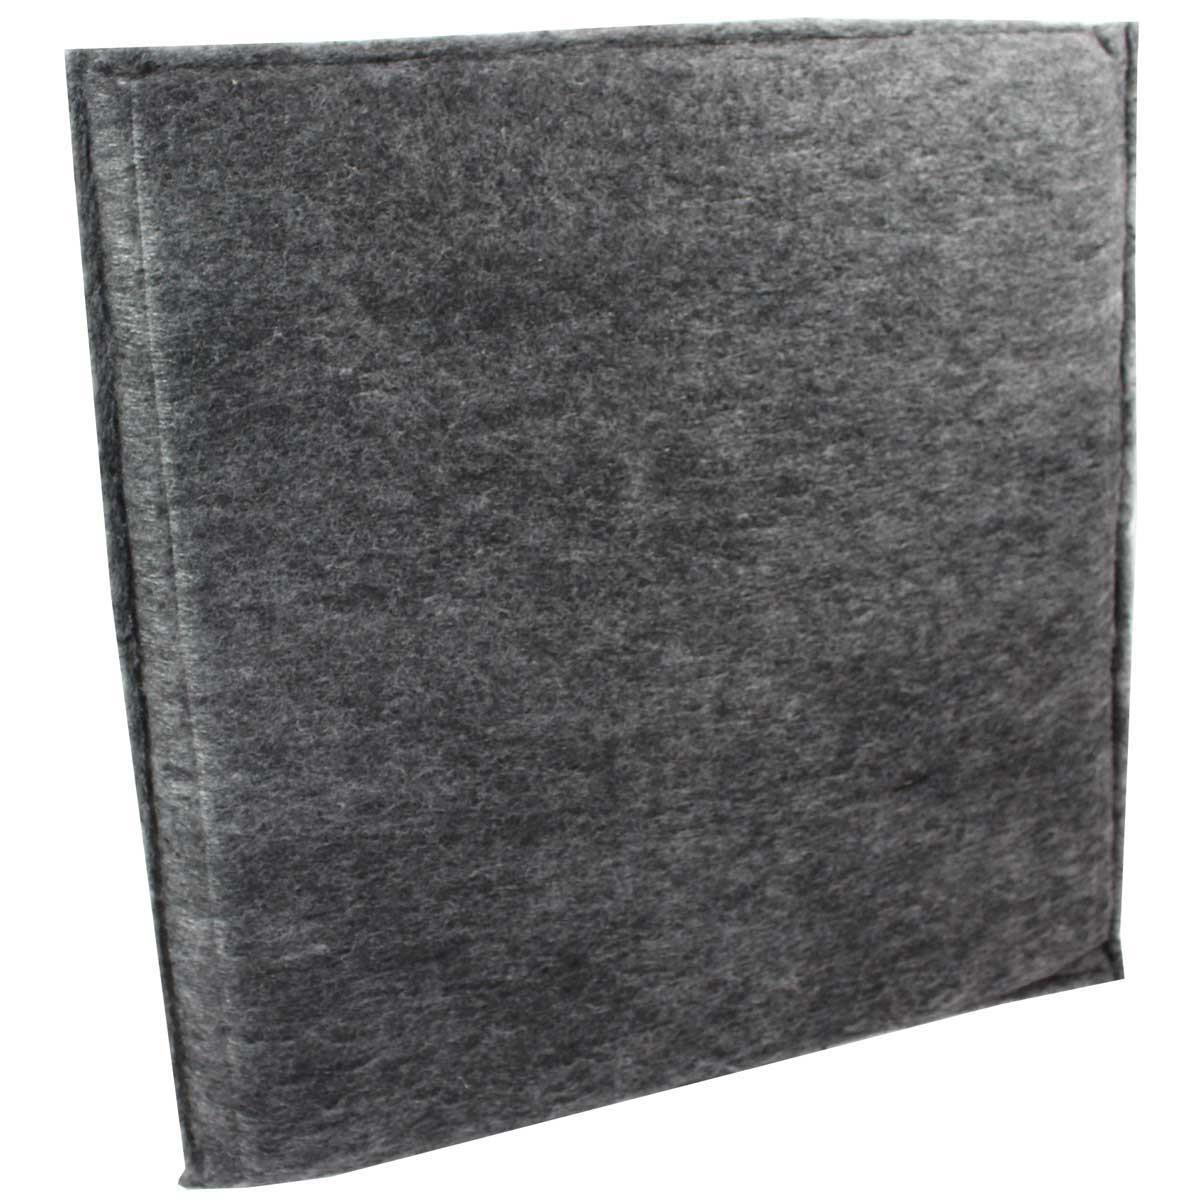 Novatek Novair 700 and 1000 Charcoal Filter